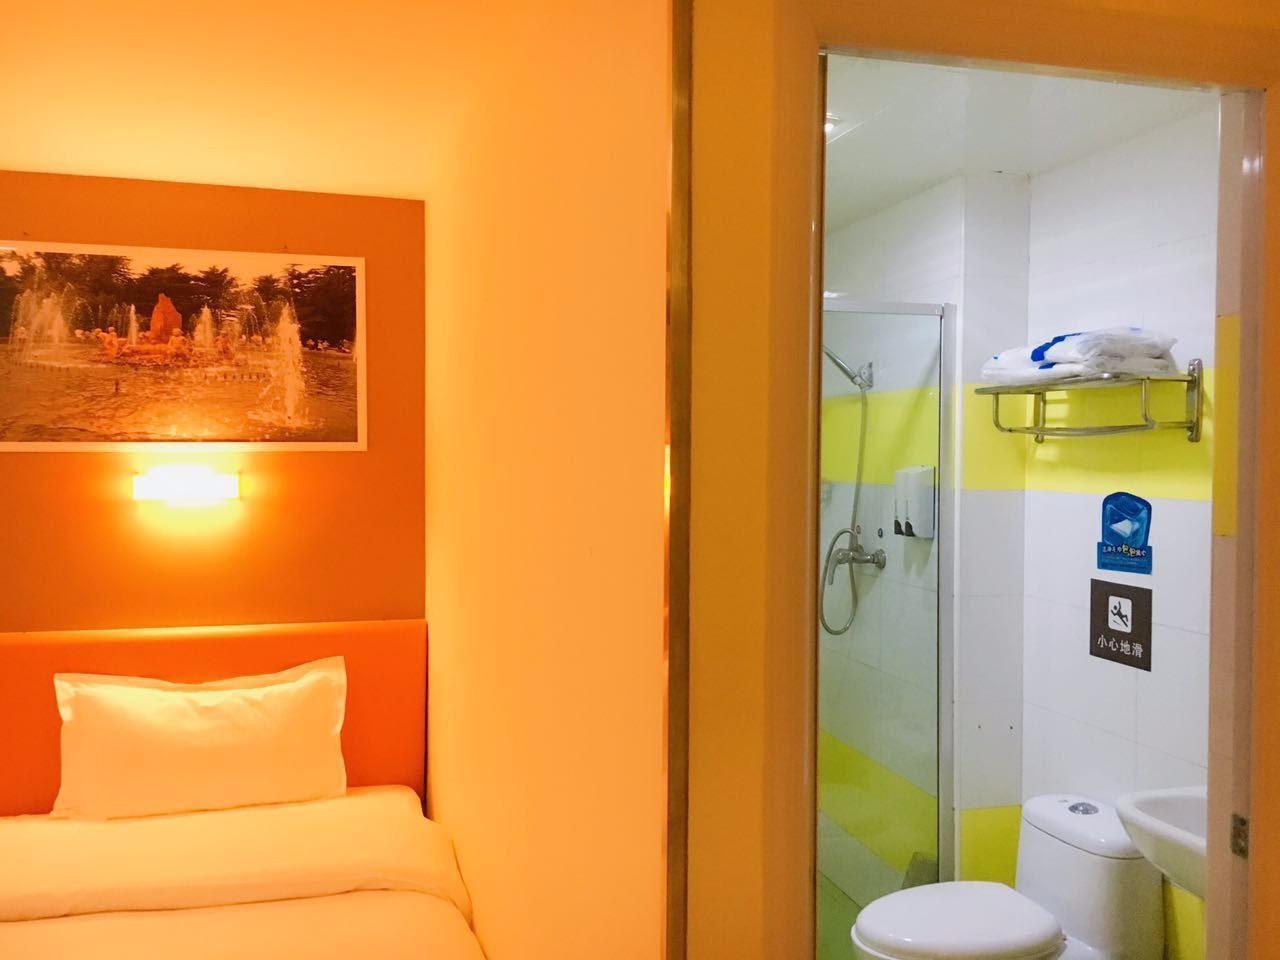 7 Days Inn Huizhou North River Jiazhaoye Centre Branch Reviews